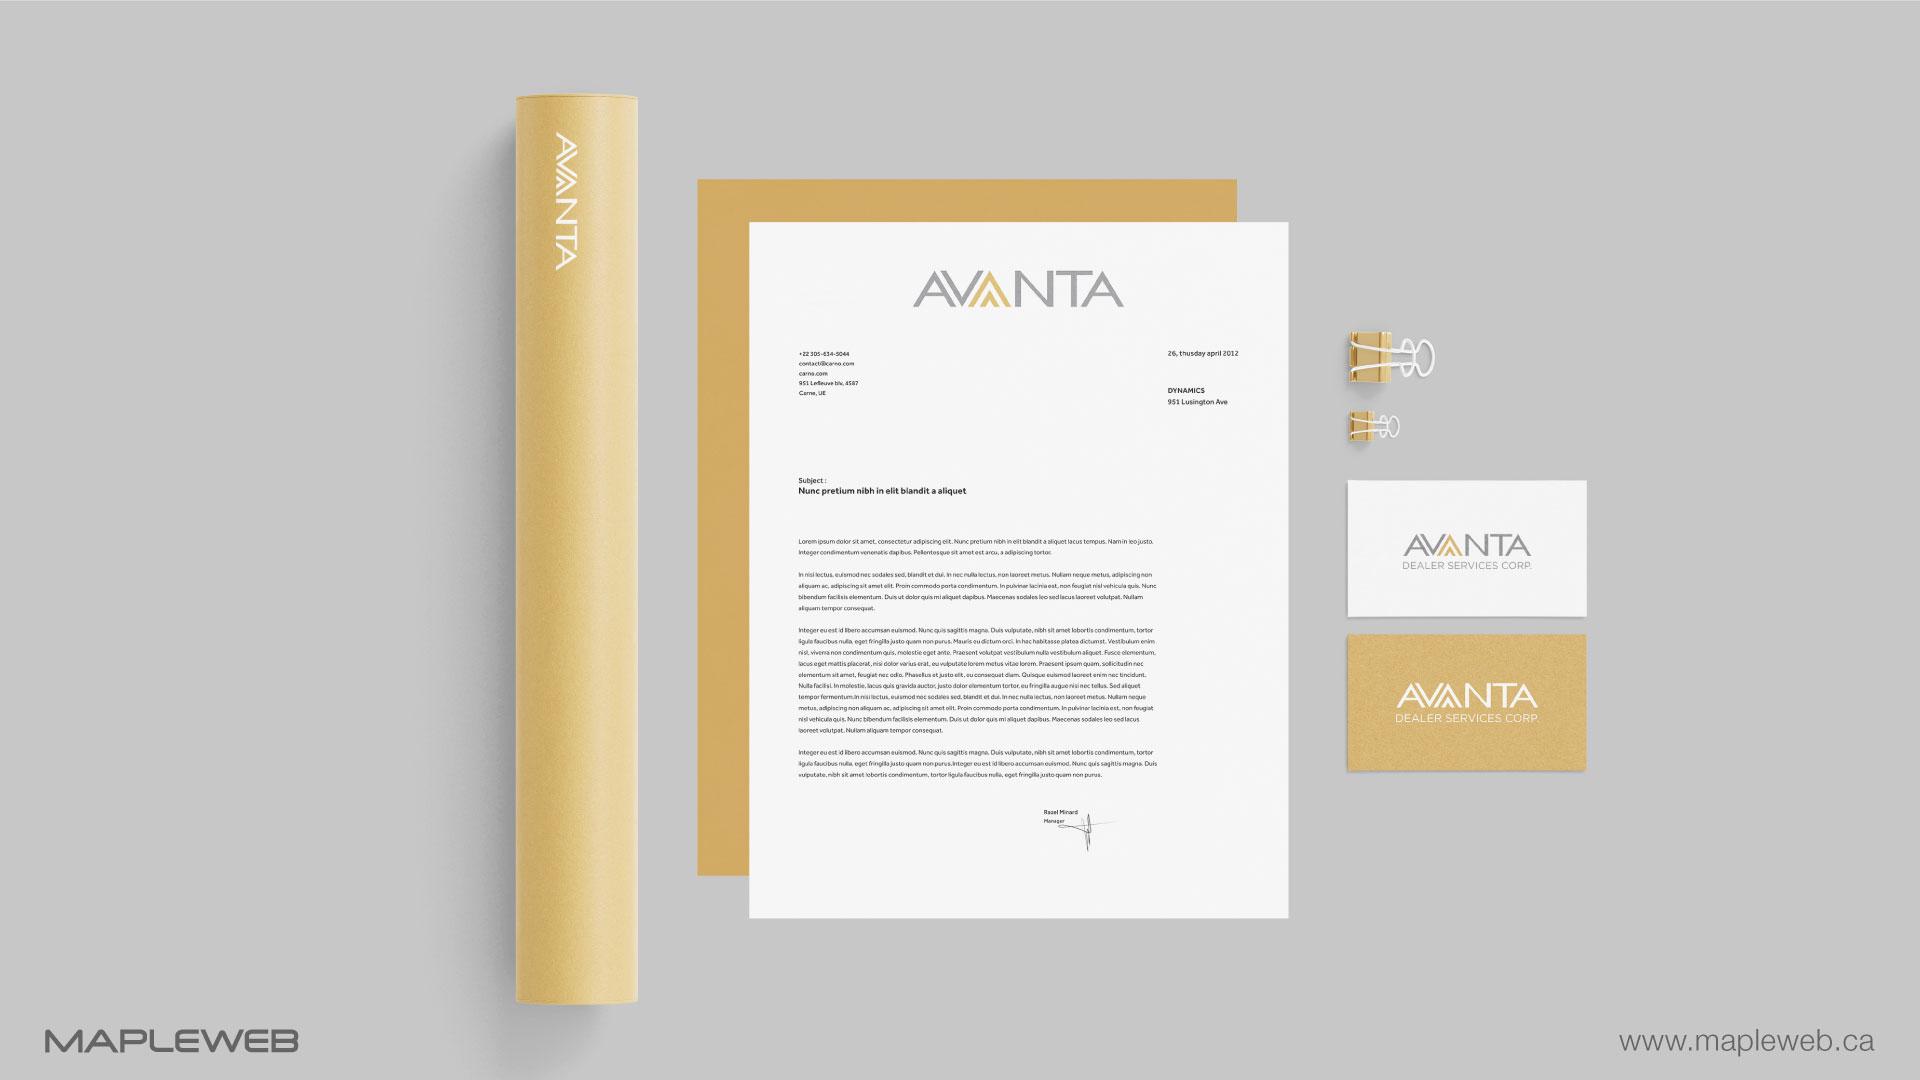 avanta-brand-logo-design-by-mapleweb-vancouver-canada-stationery-mock